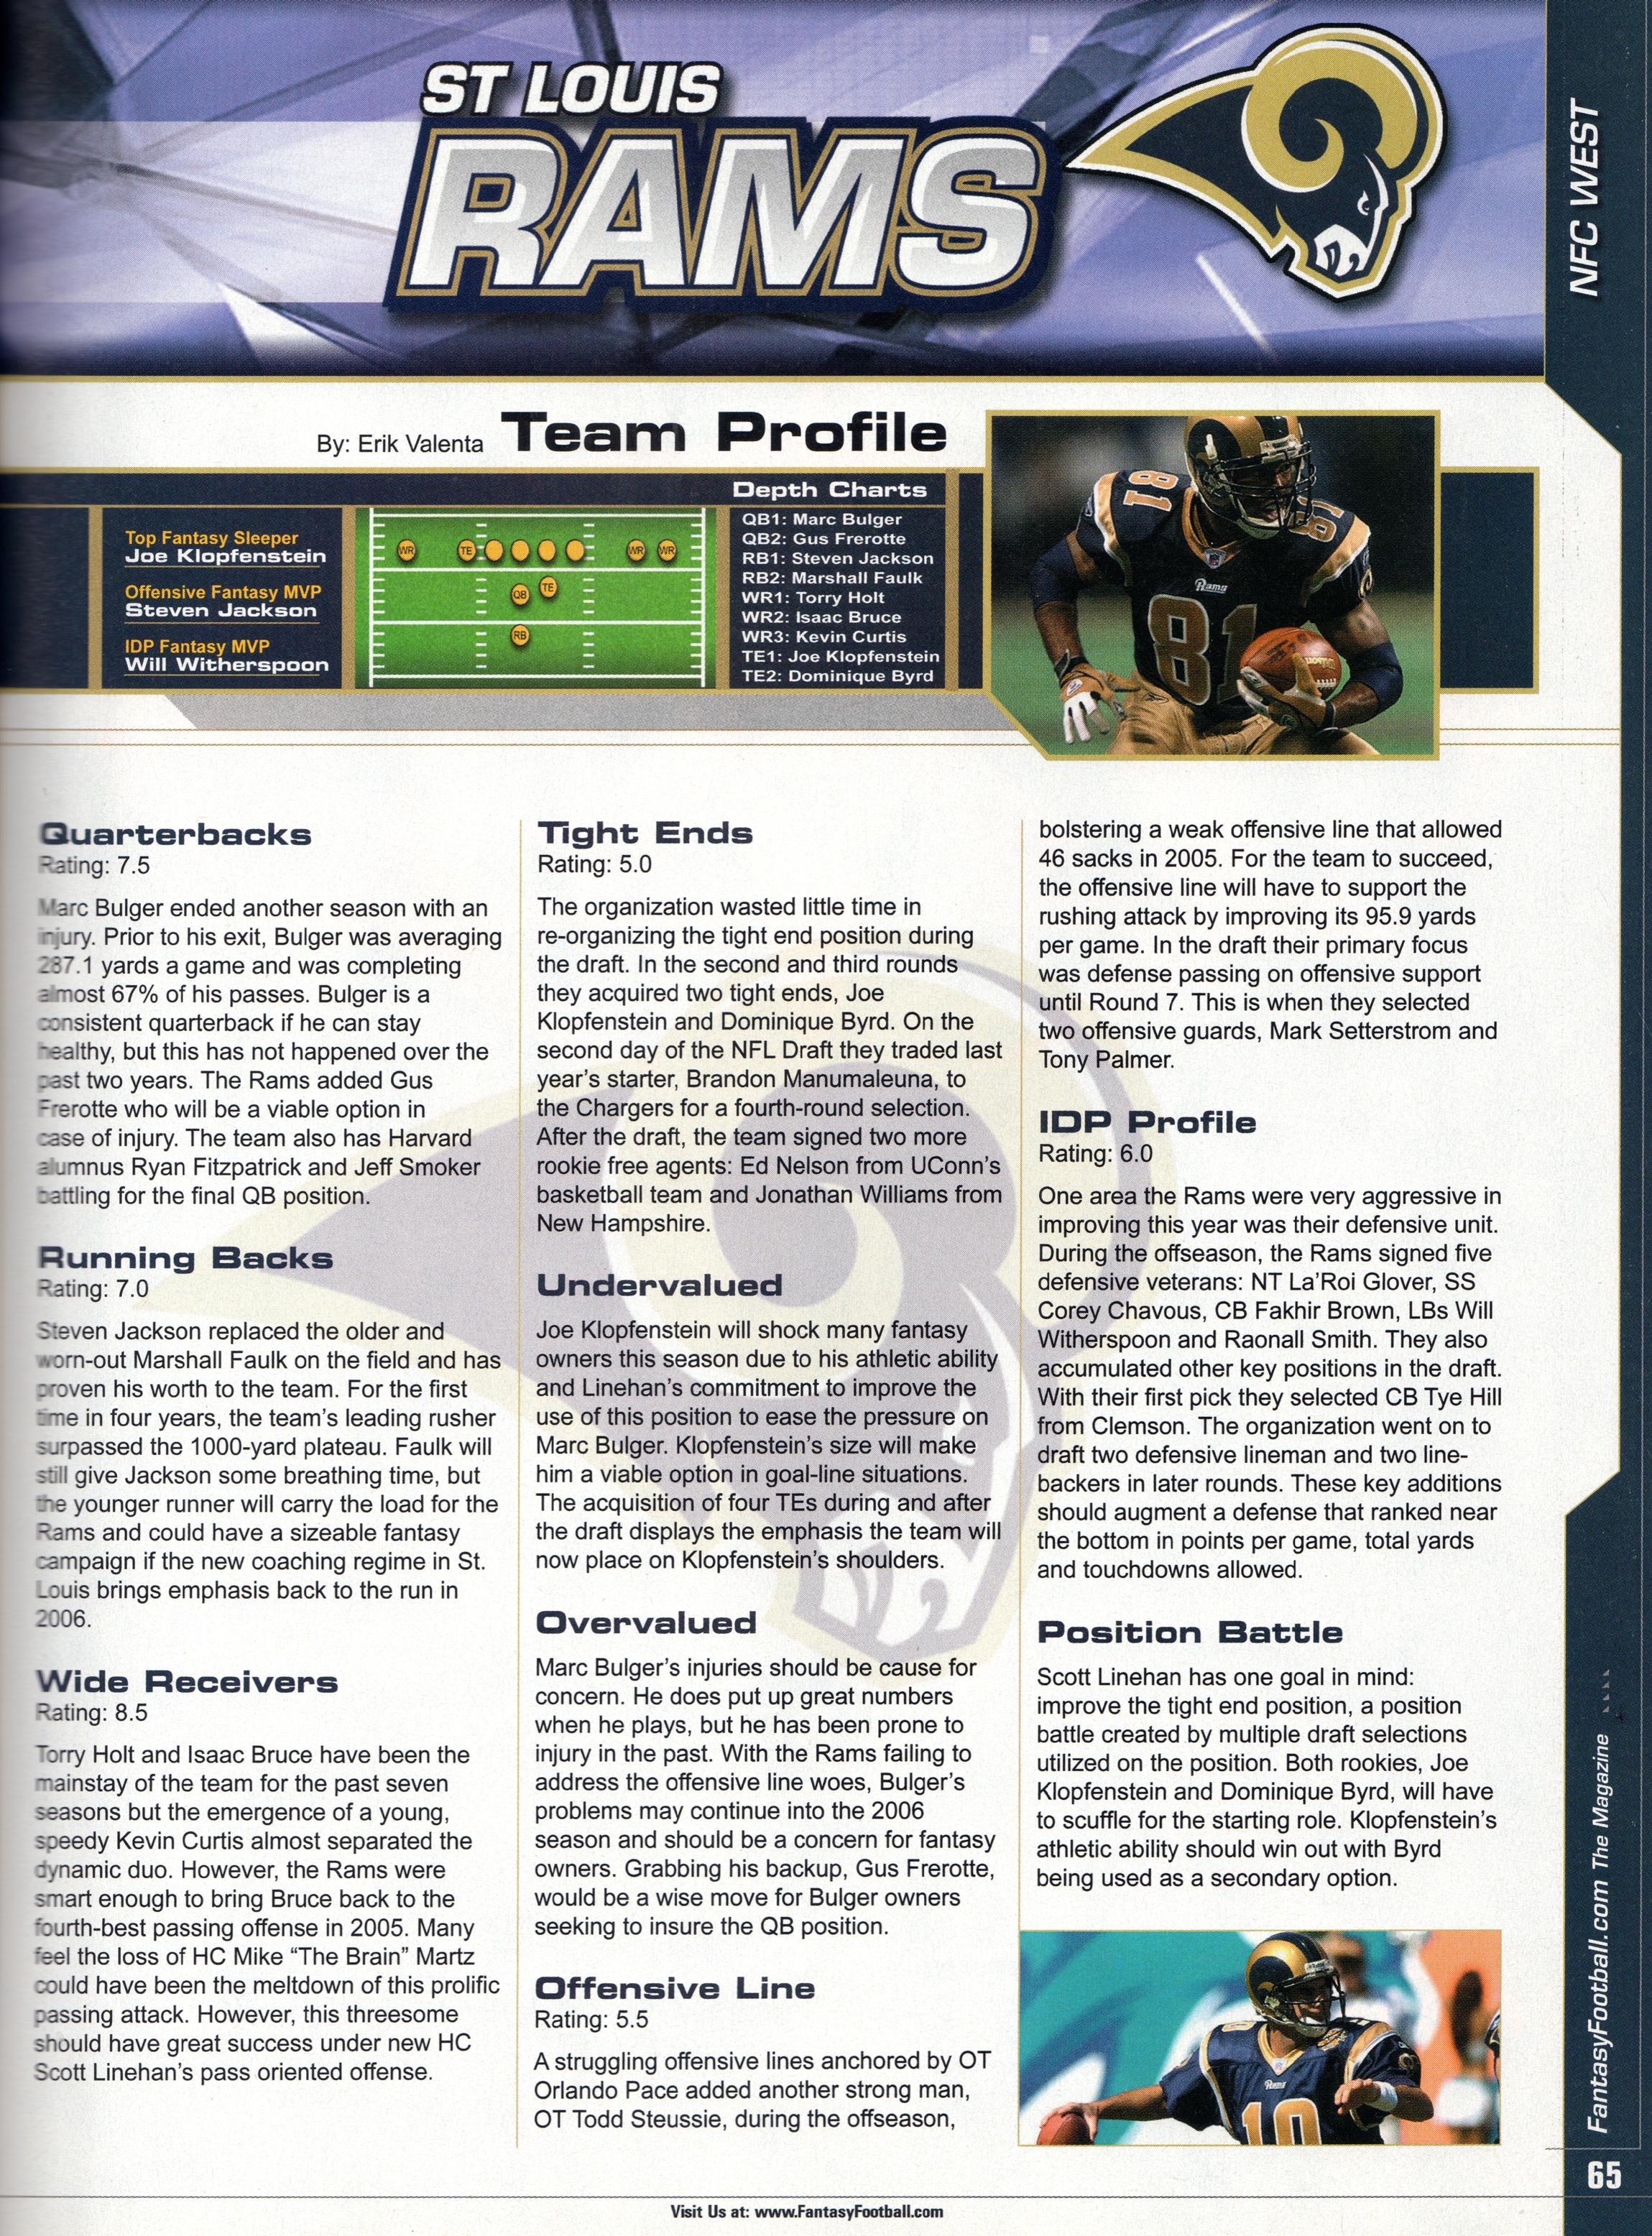 FantasyFootball.com Rams Article